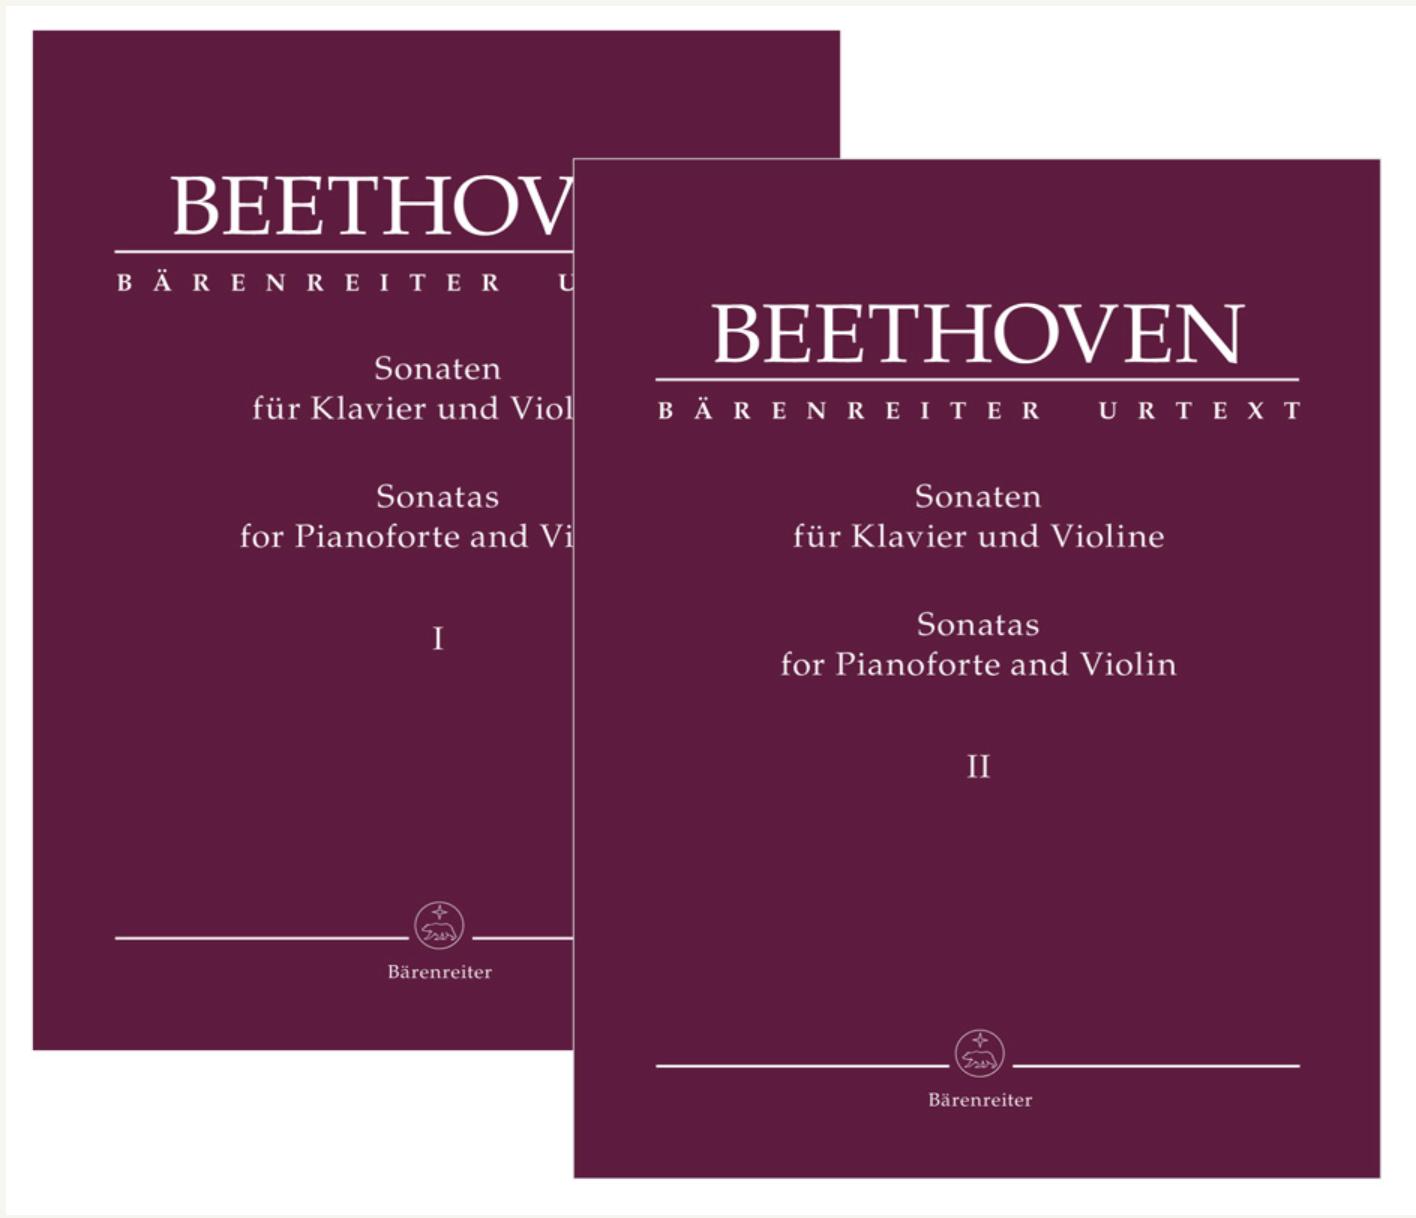 Barenreiter Beethoven: Sonatas for Pianoforte and Violin (violin and piano) Barenreiter